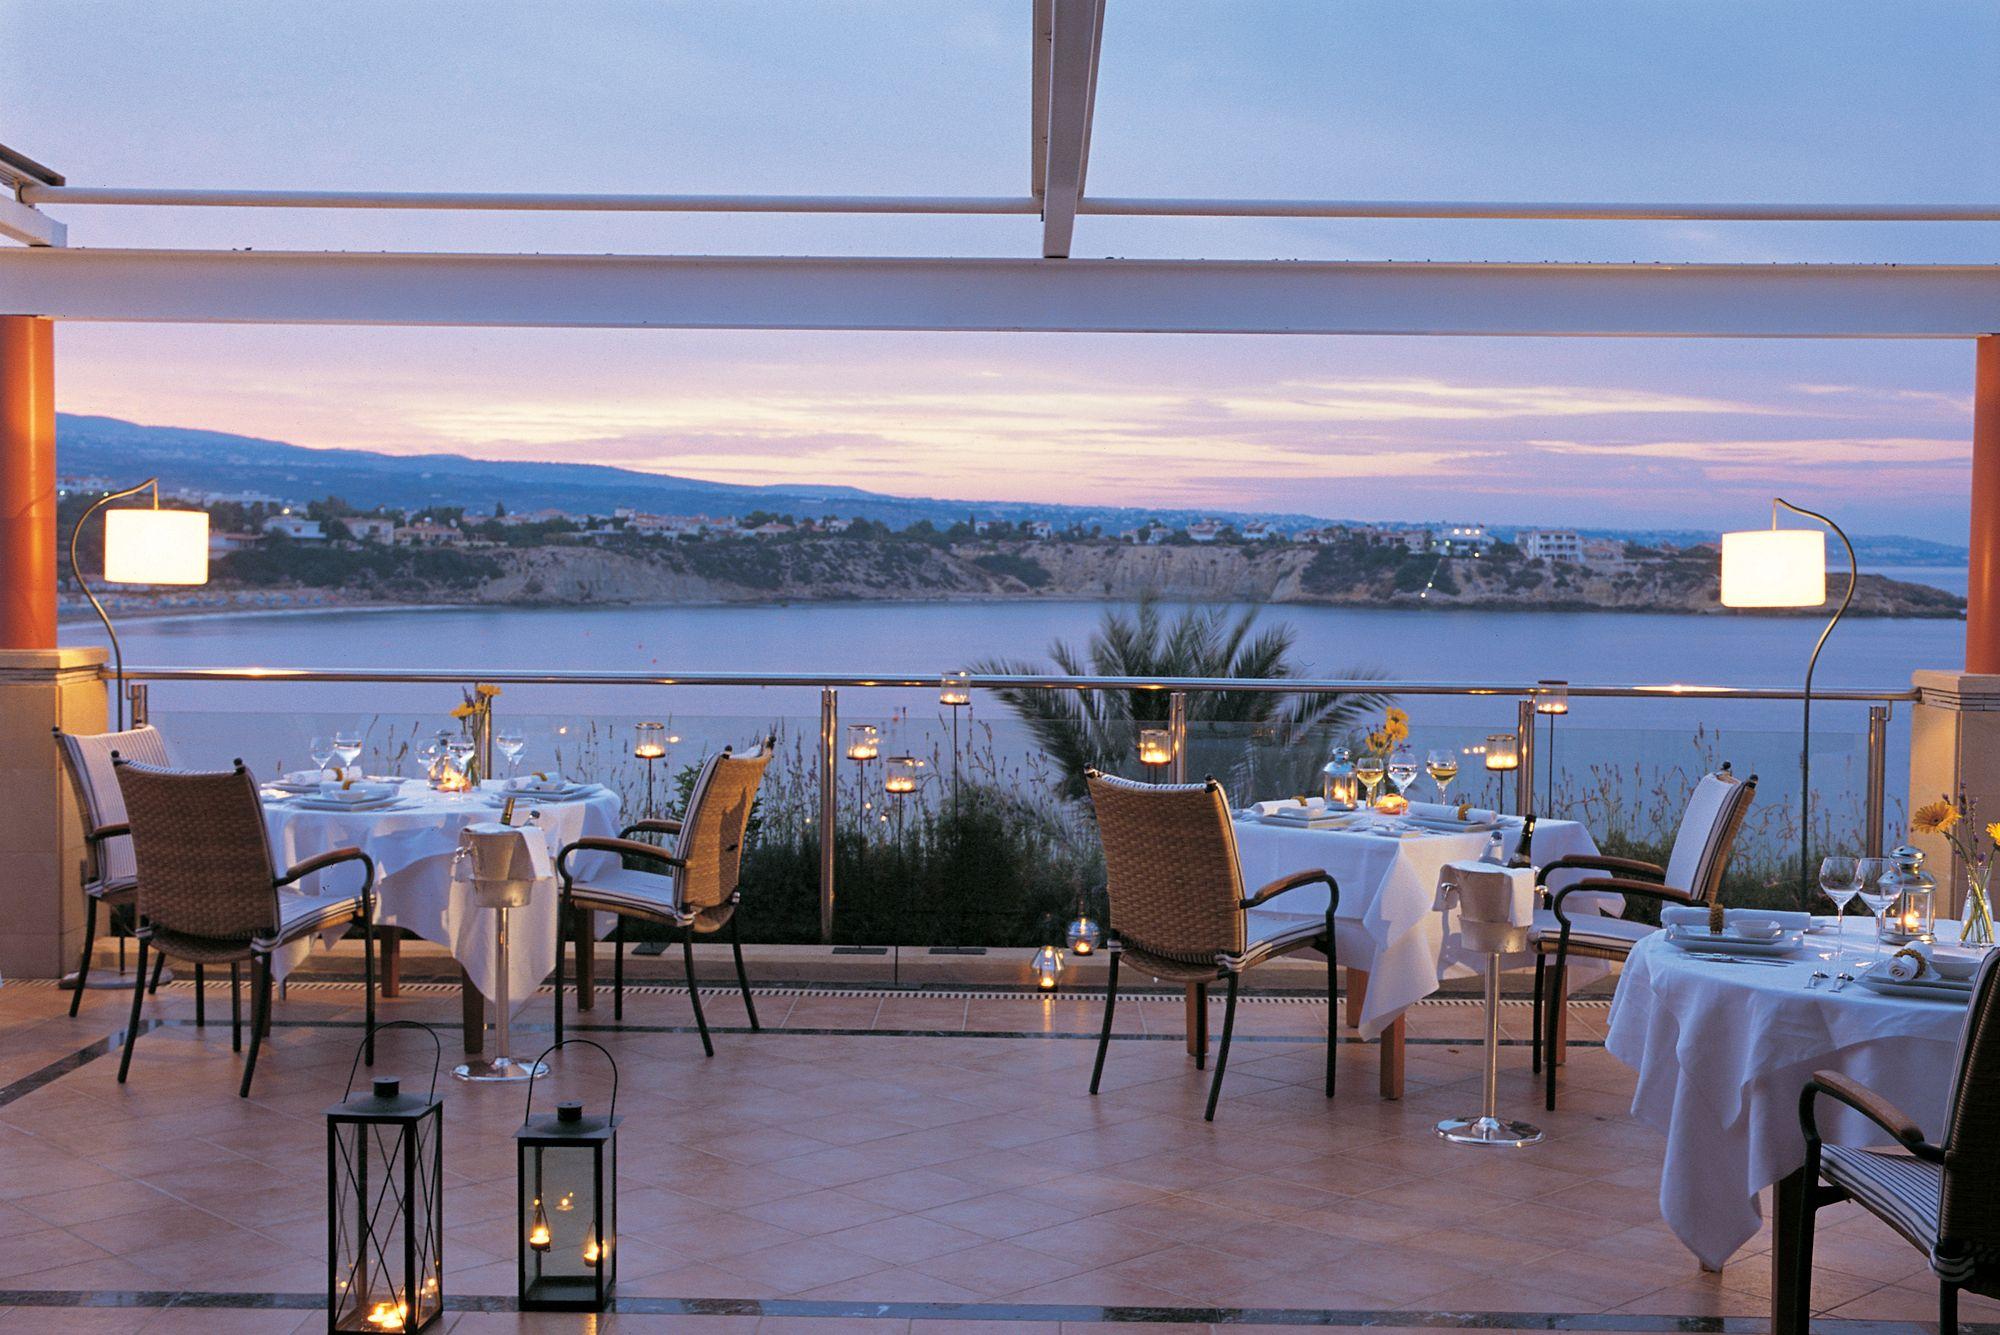 Thalassa Boutique Hotel & Spa #paphos Cyprus Sentido